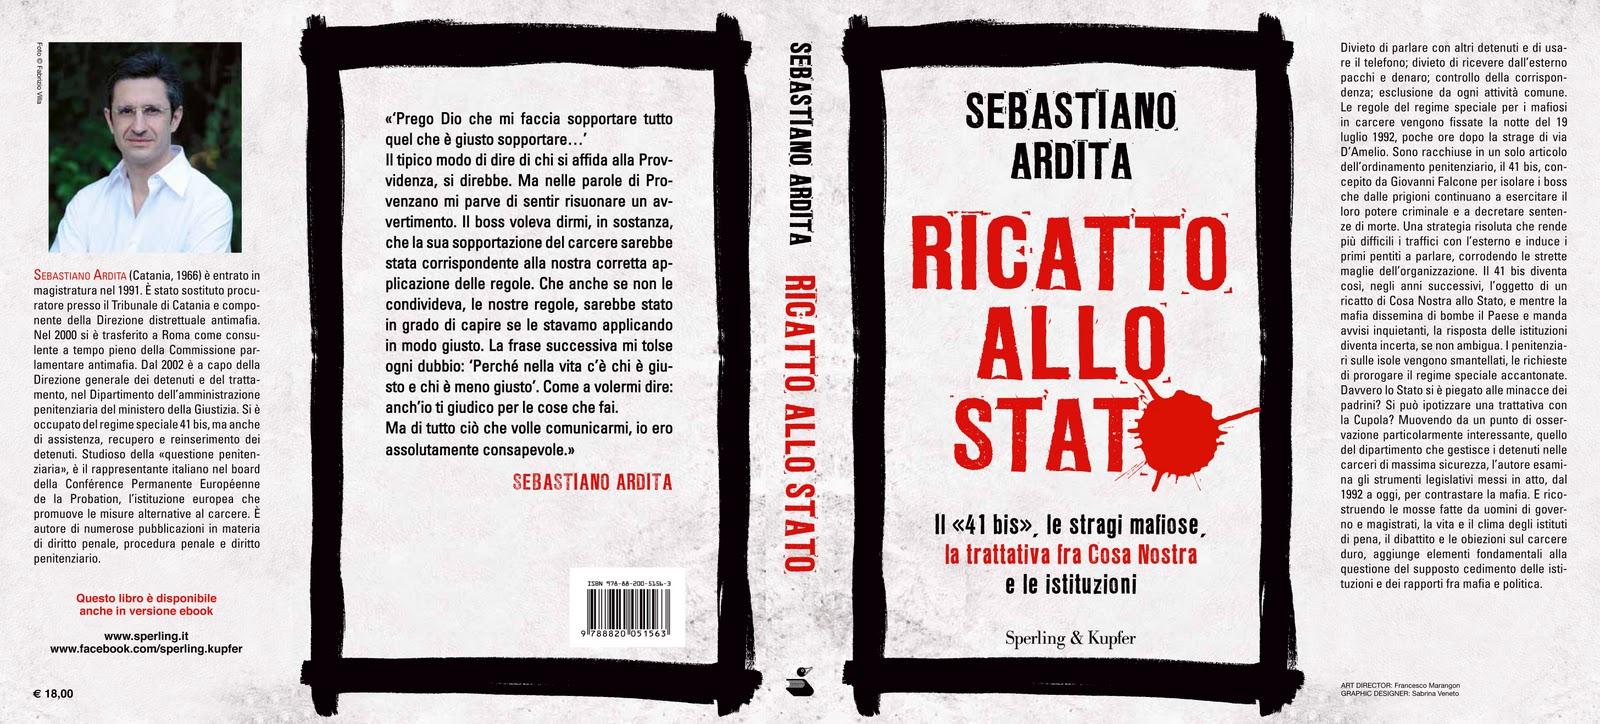 http://4.bp.blogspot.com/-LCCmjFMkTYo/Tn3aXZO5J5I/AAAAAAAAA64/Z46rFTBg43w/s1600/Ricatto+allo+stato.jpg